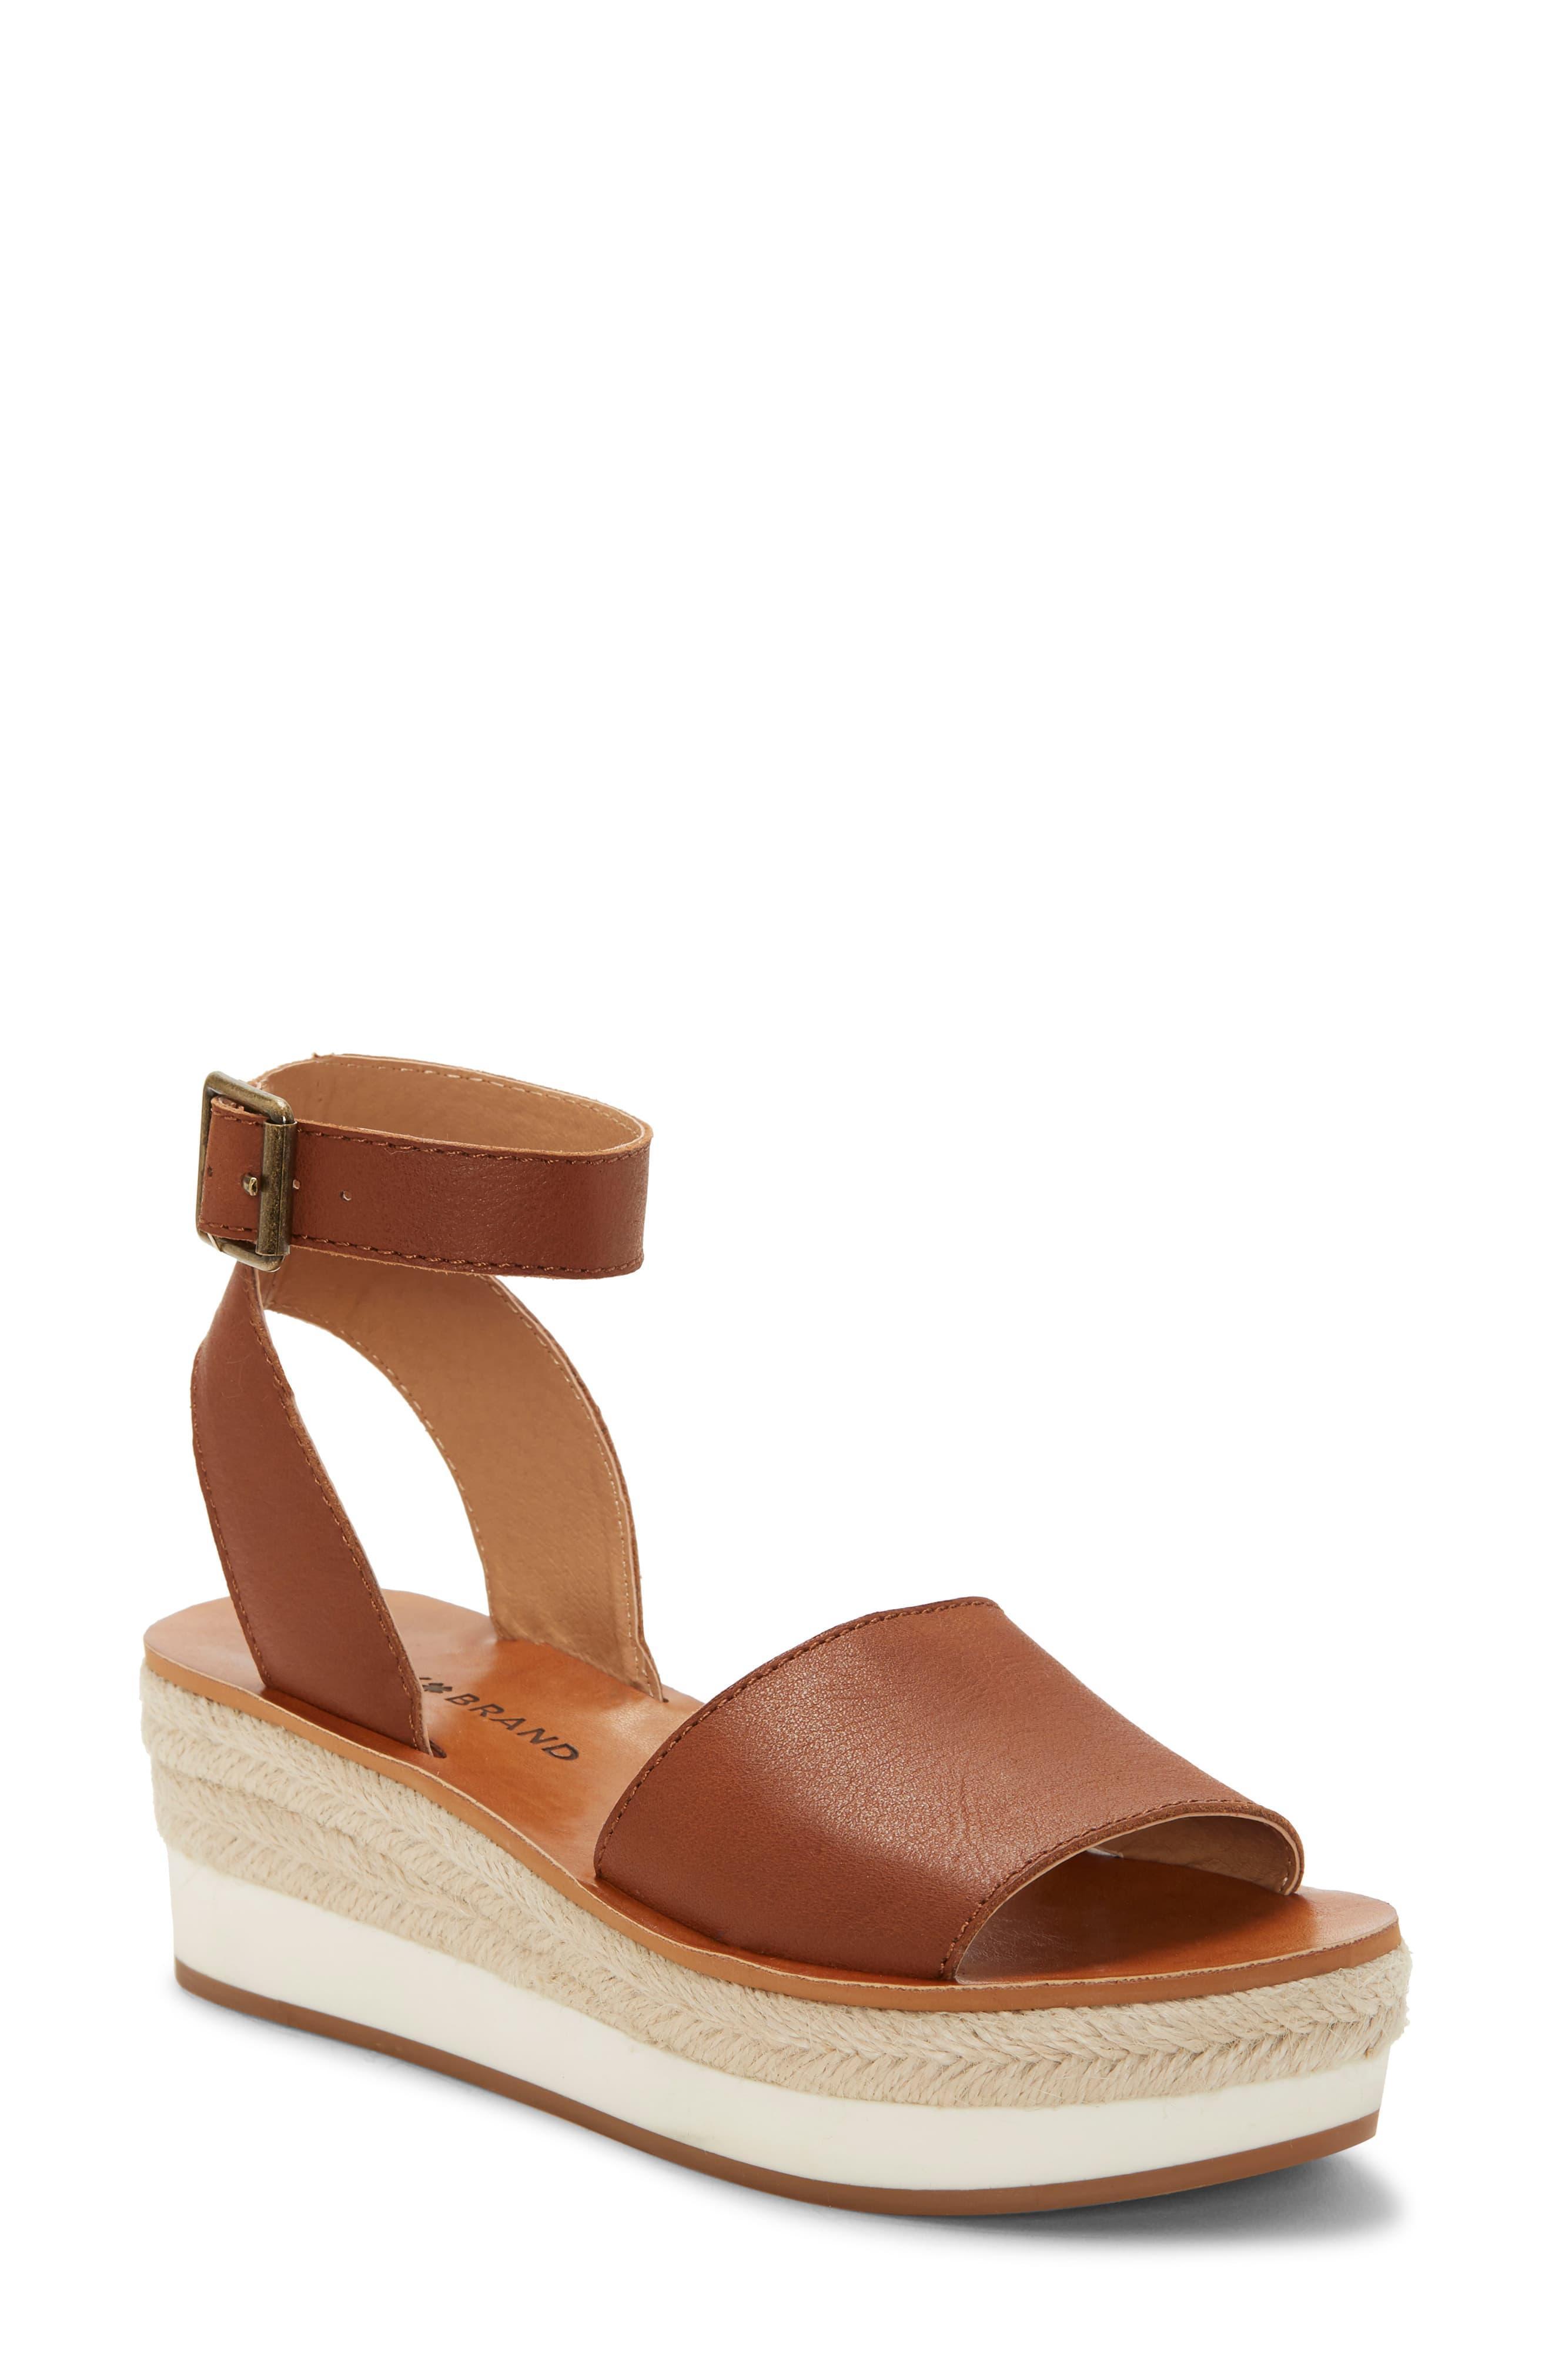 3b3a739e91c Women's Brown Joodith Platform Wedge Sandal